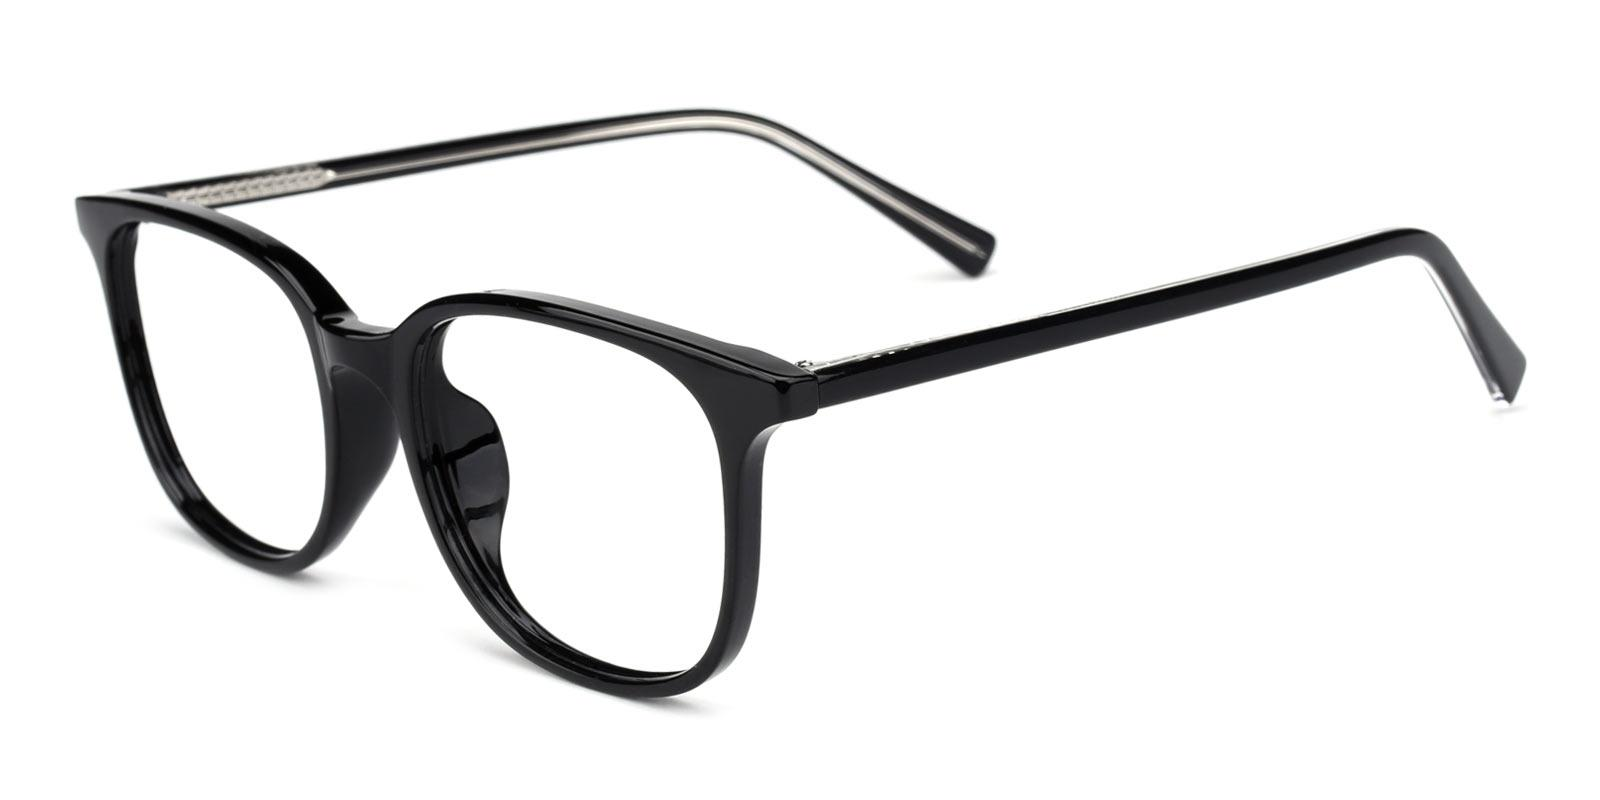 Corson-Black-Rectangle-TR-Eyeglasses-detail